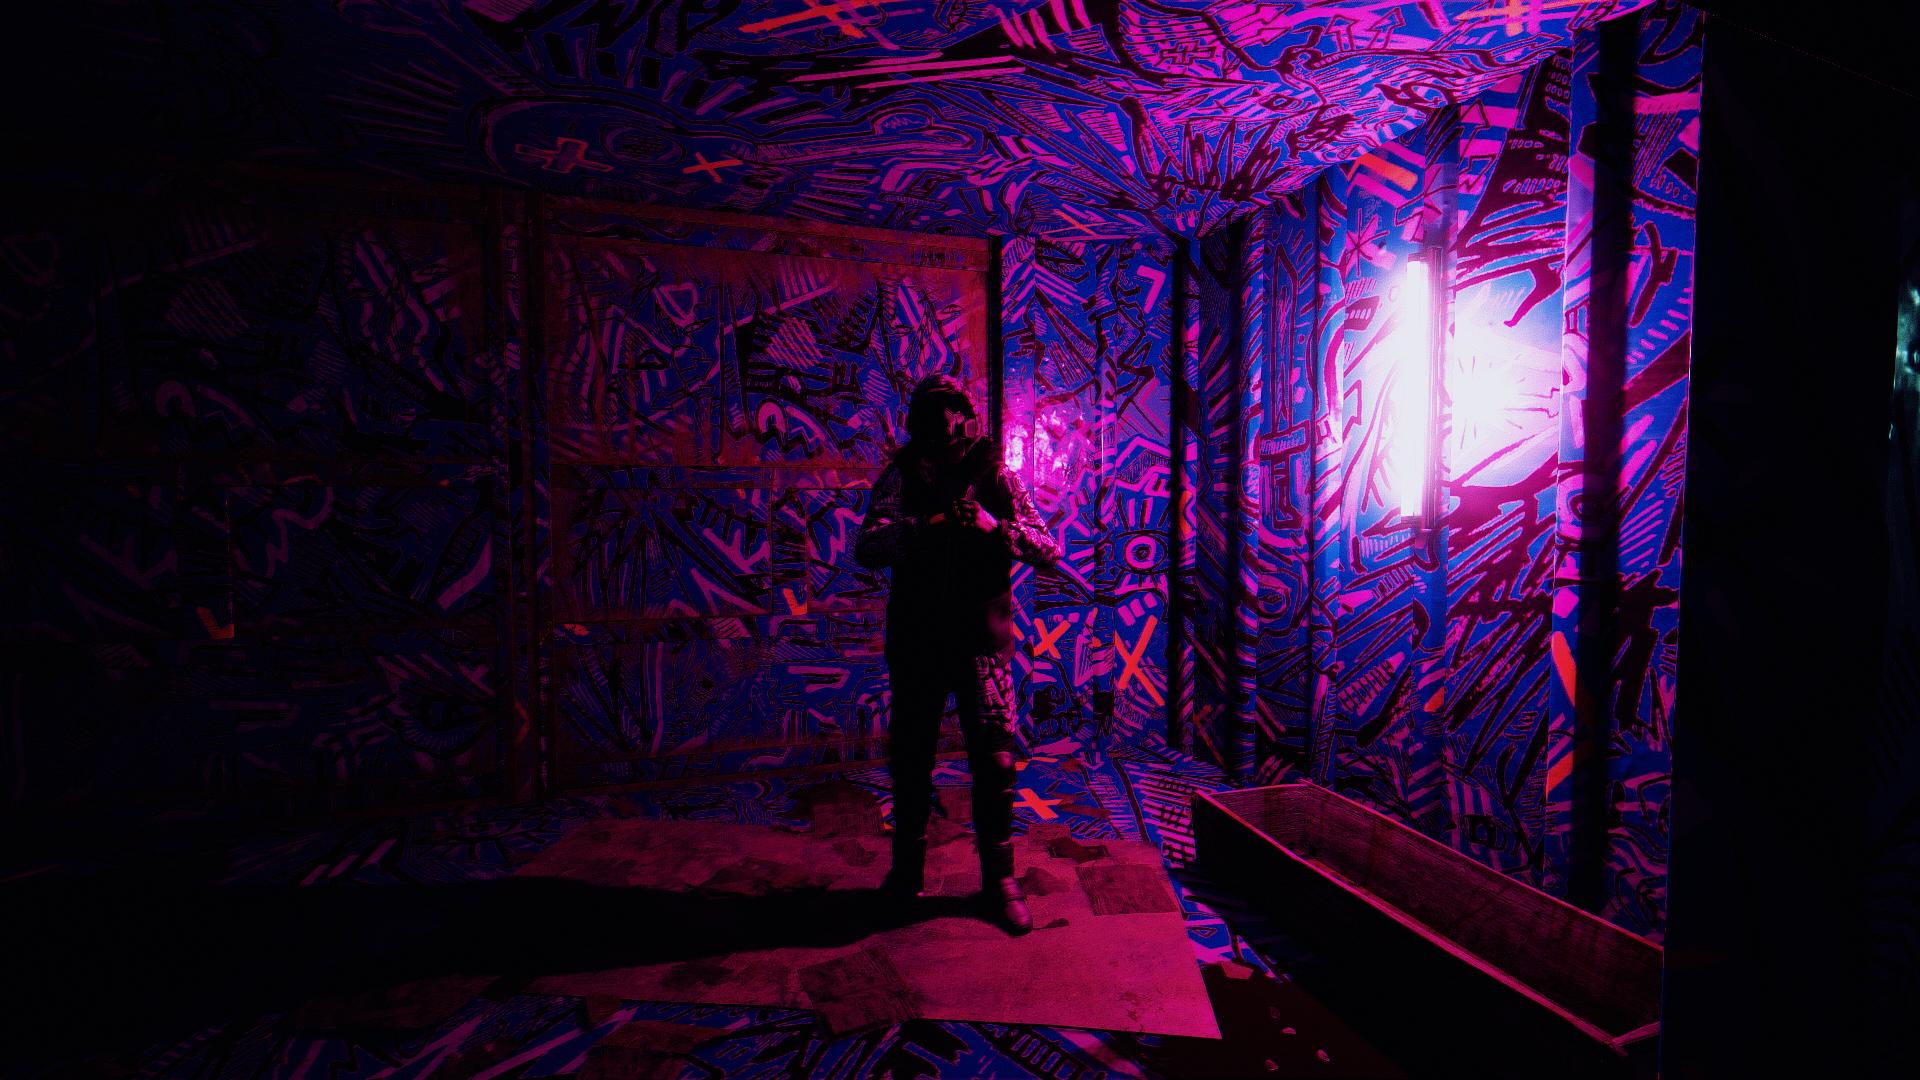 Far Cry New Dawn Screenshot 2019.05.26 - 19.16.52.40.png - Far Cry: New Dawn